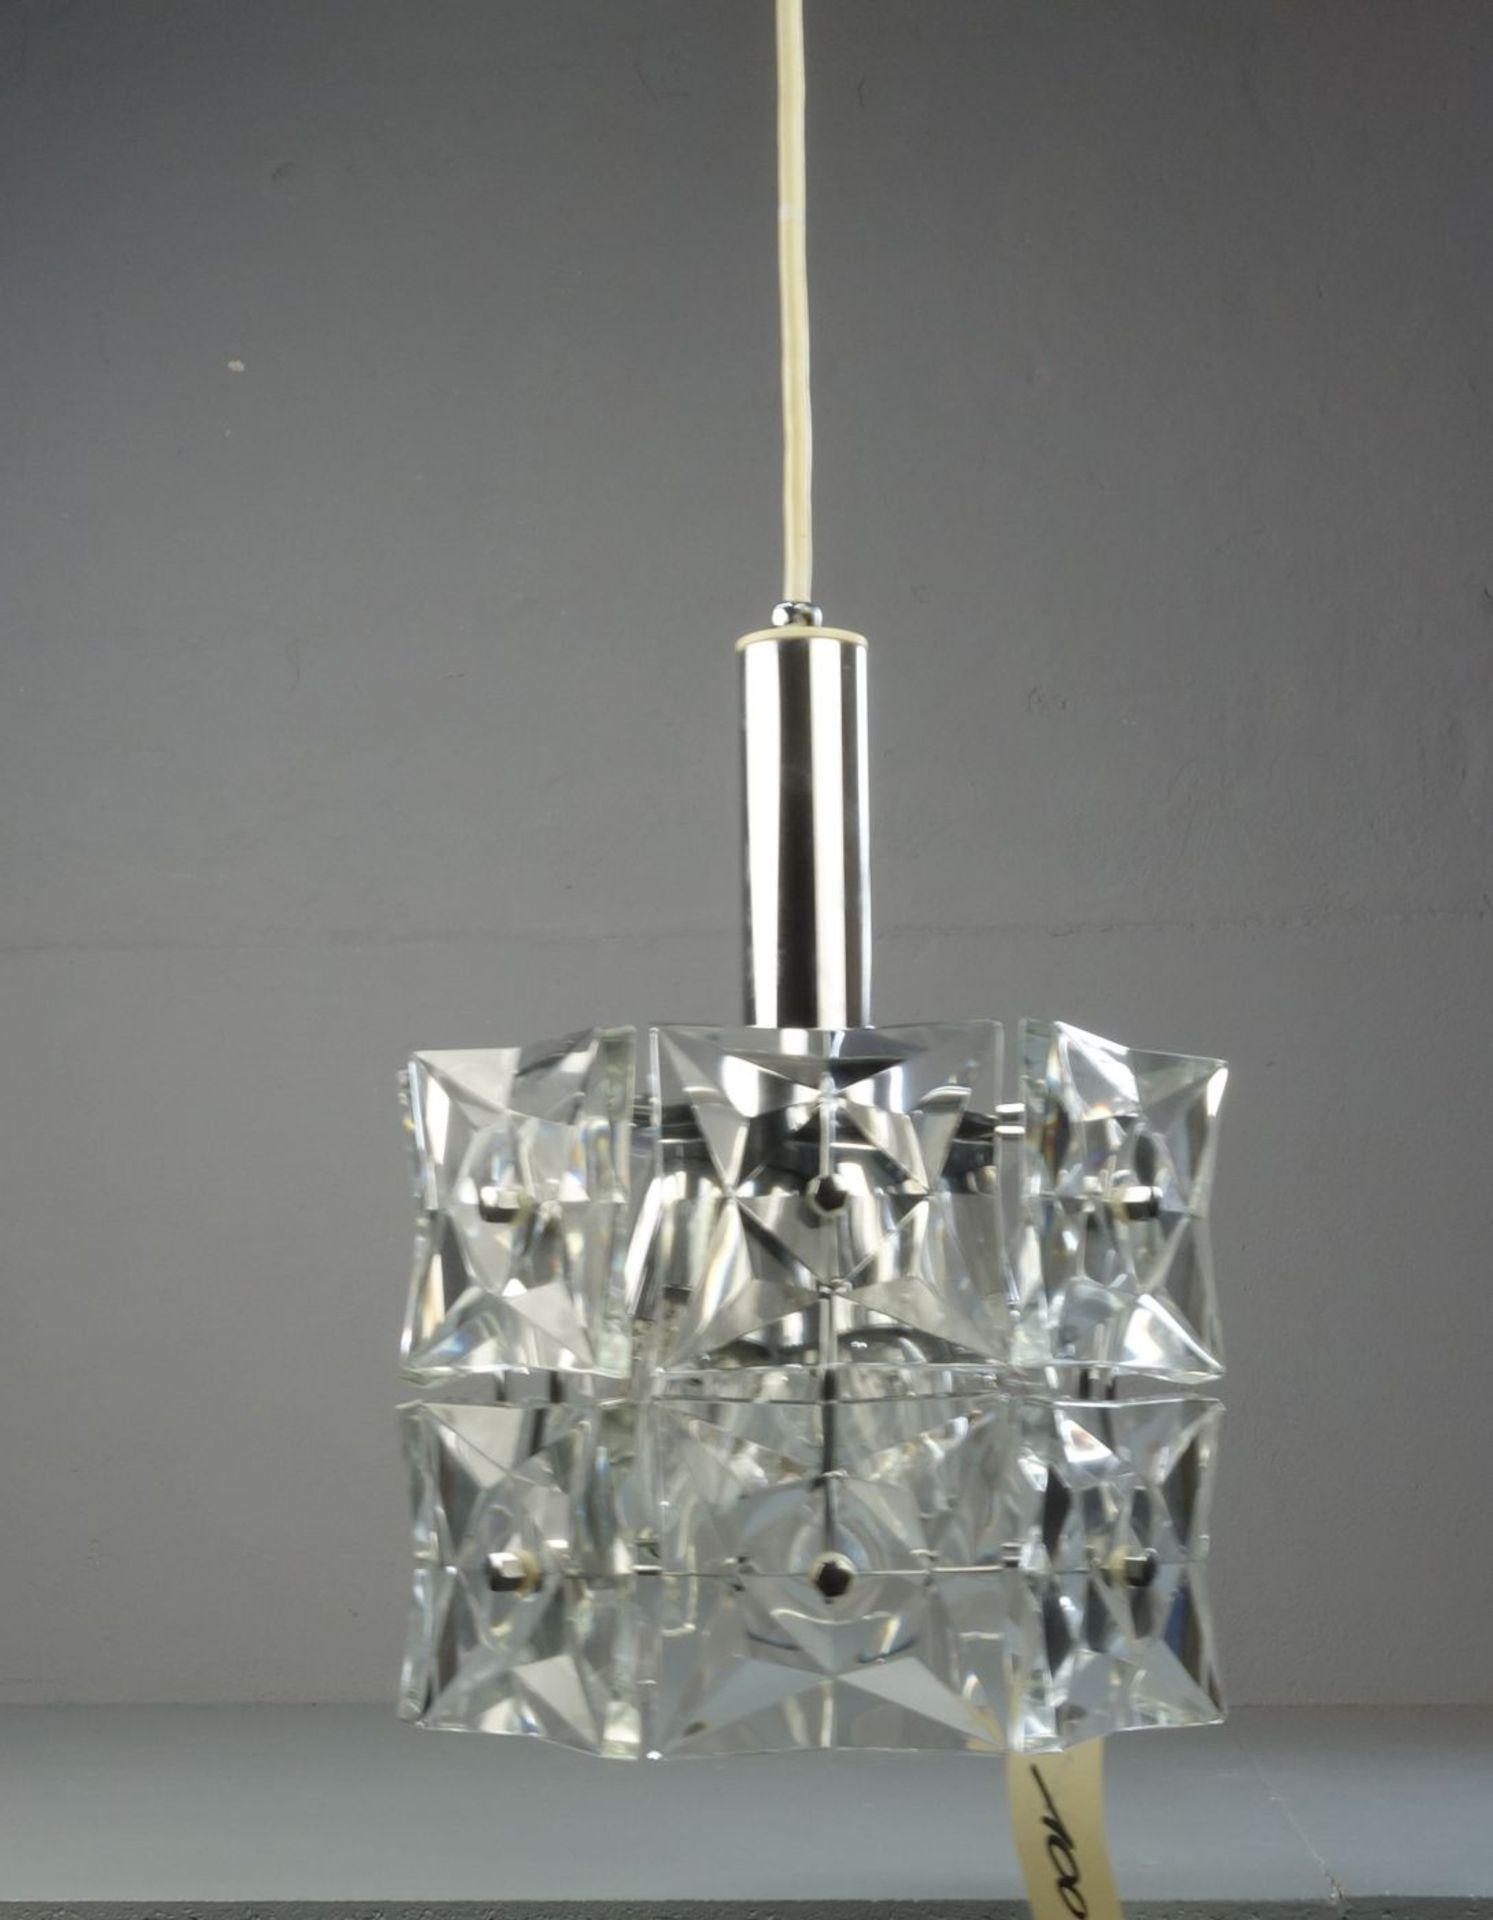 Los 100 - LAMPE / DECKENLAMPE / lamp, mid century design, Manufaktur Kinkeldey / Österreich, 1960er /...